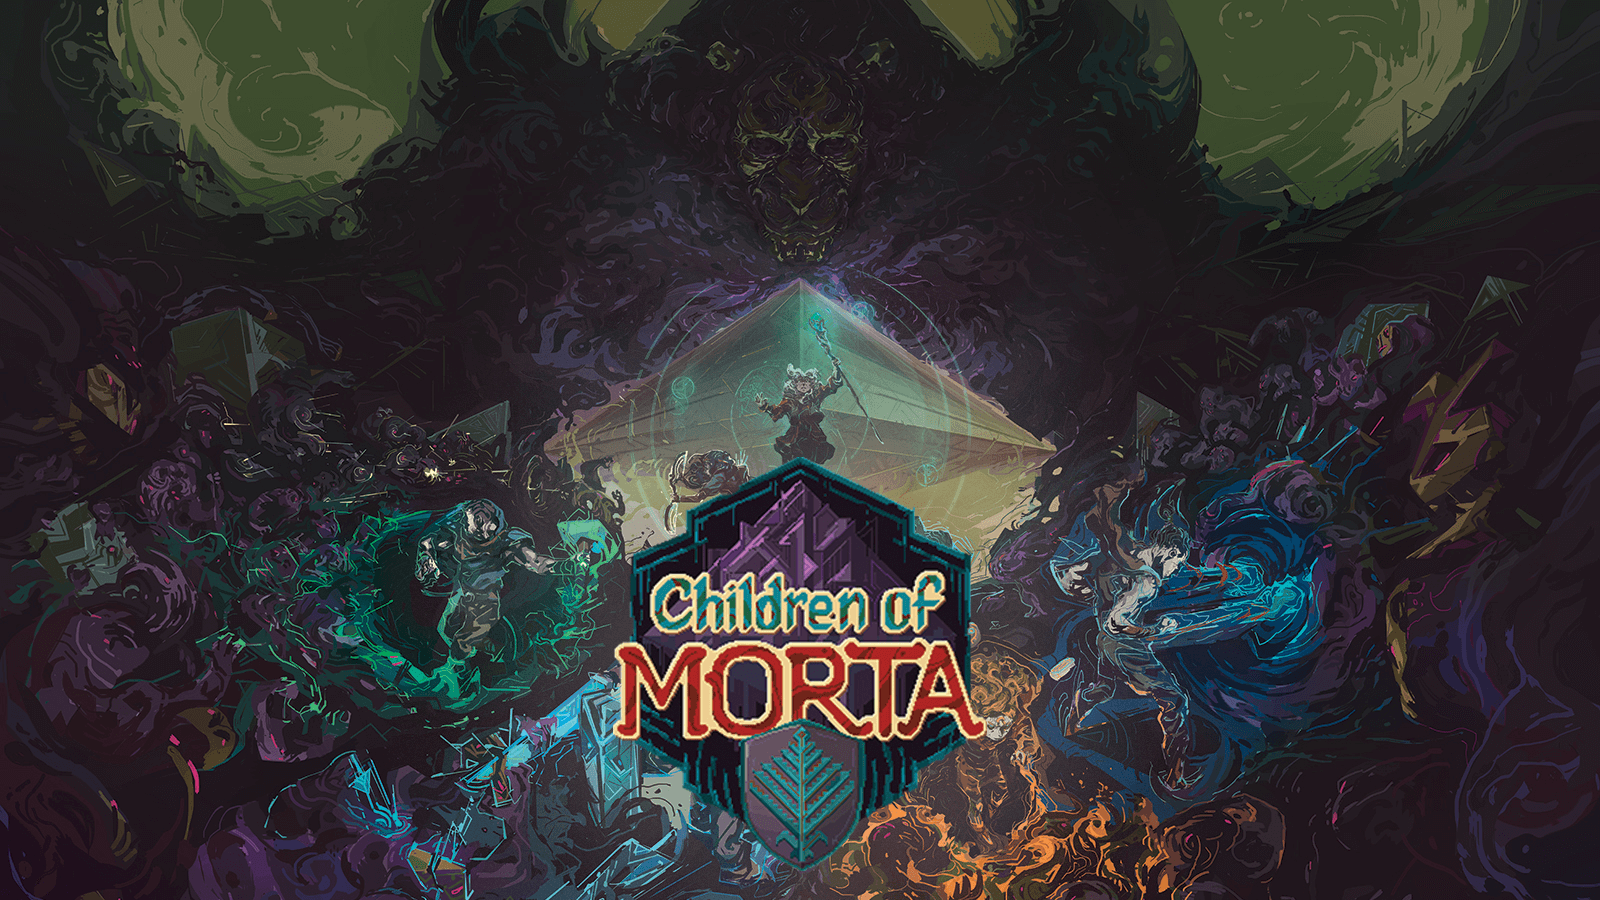 children of morta computer wallpaper 69149